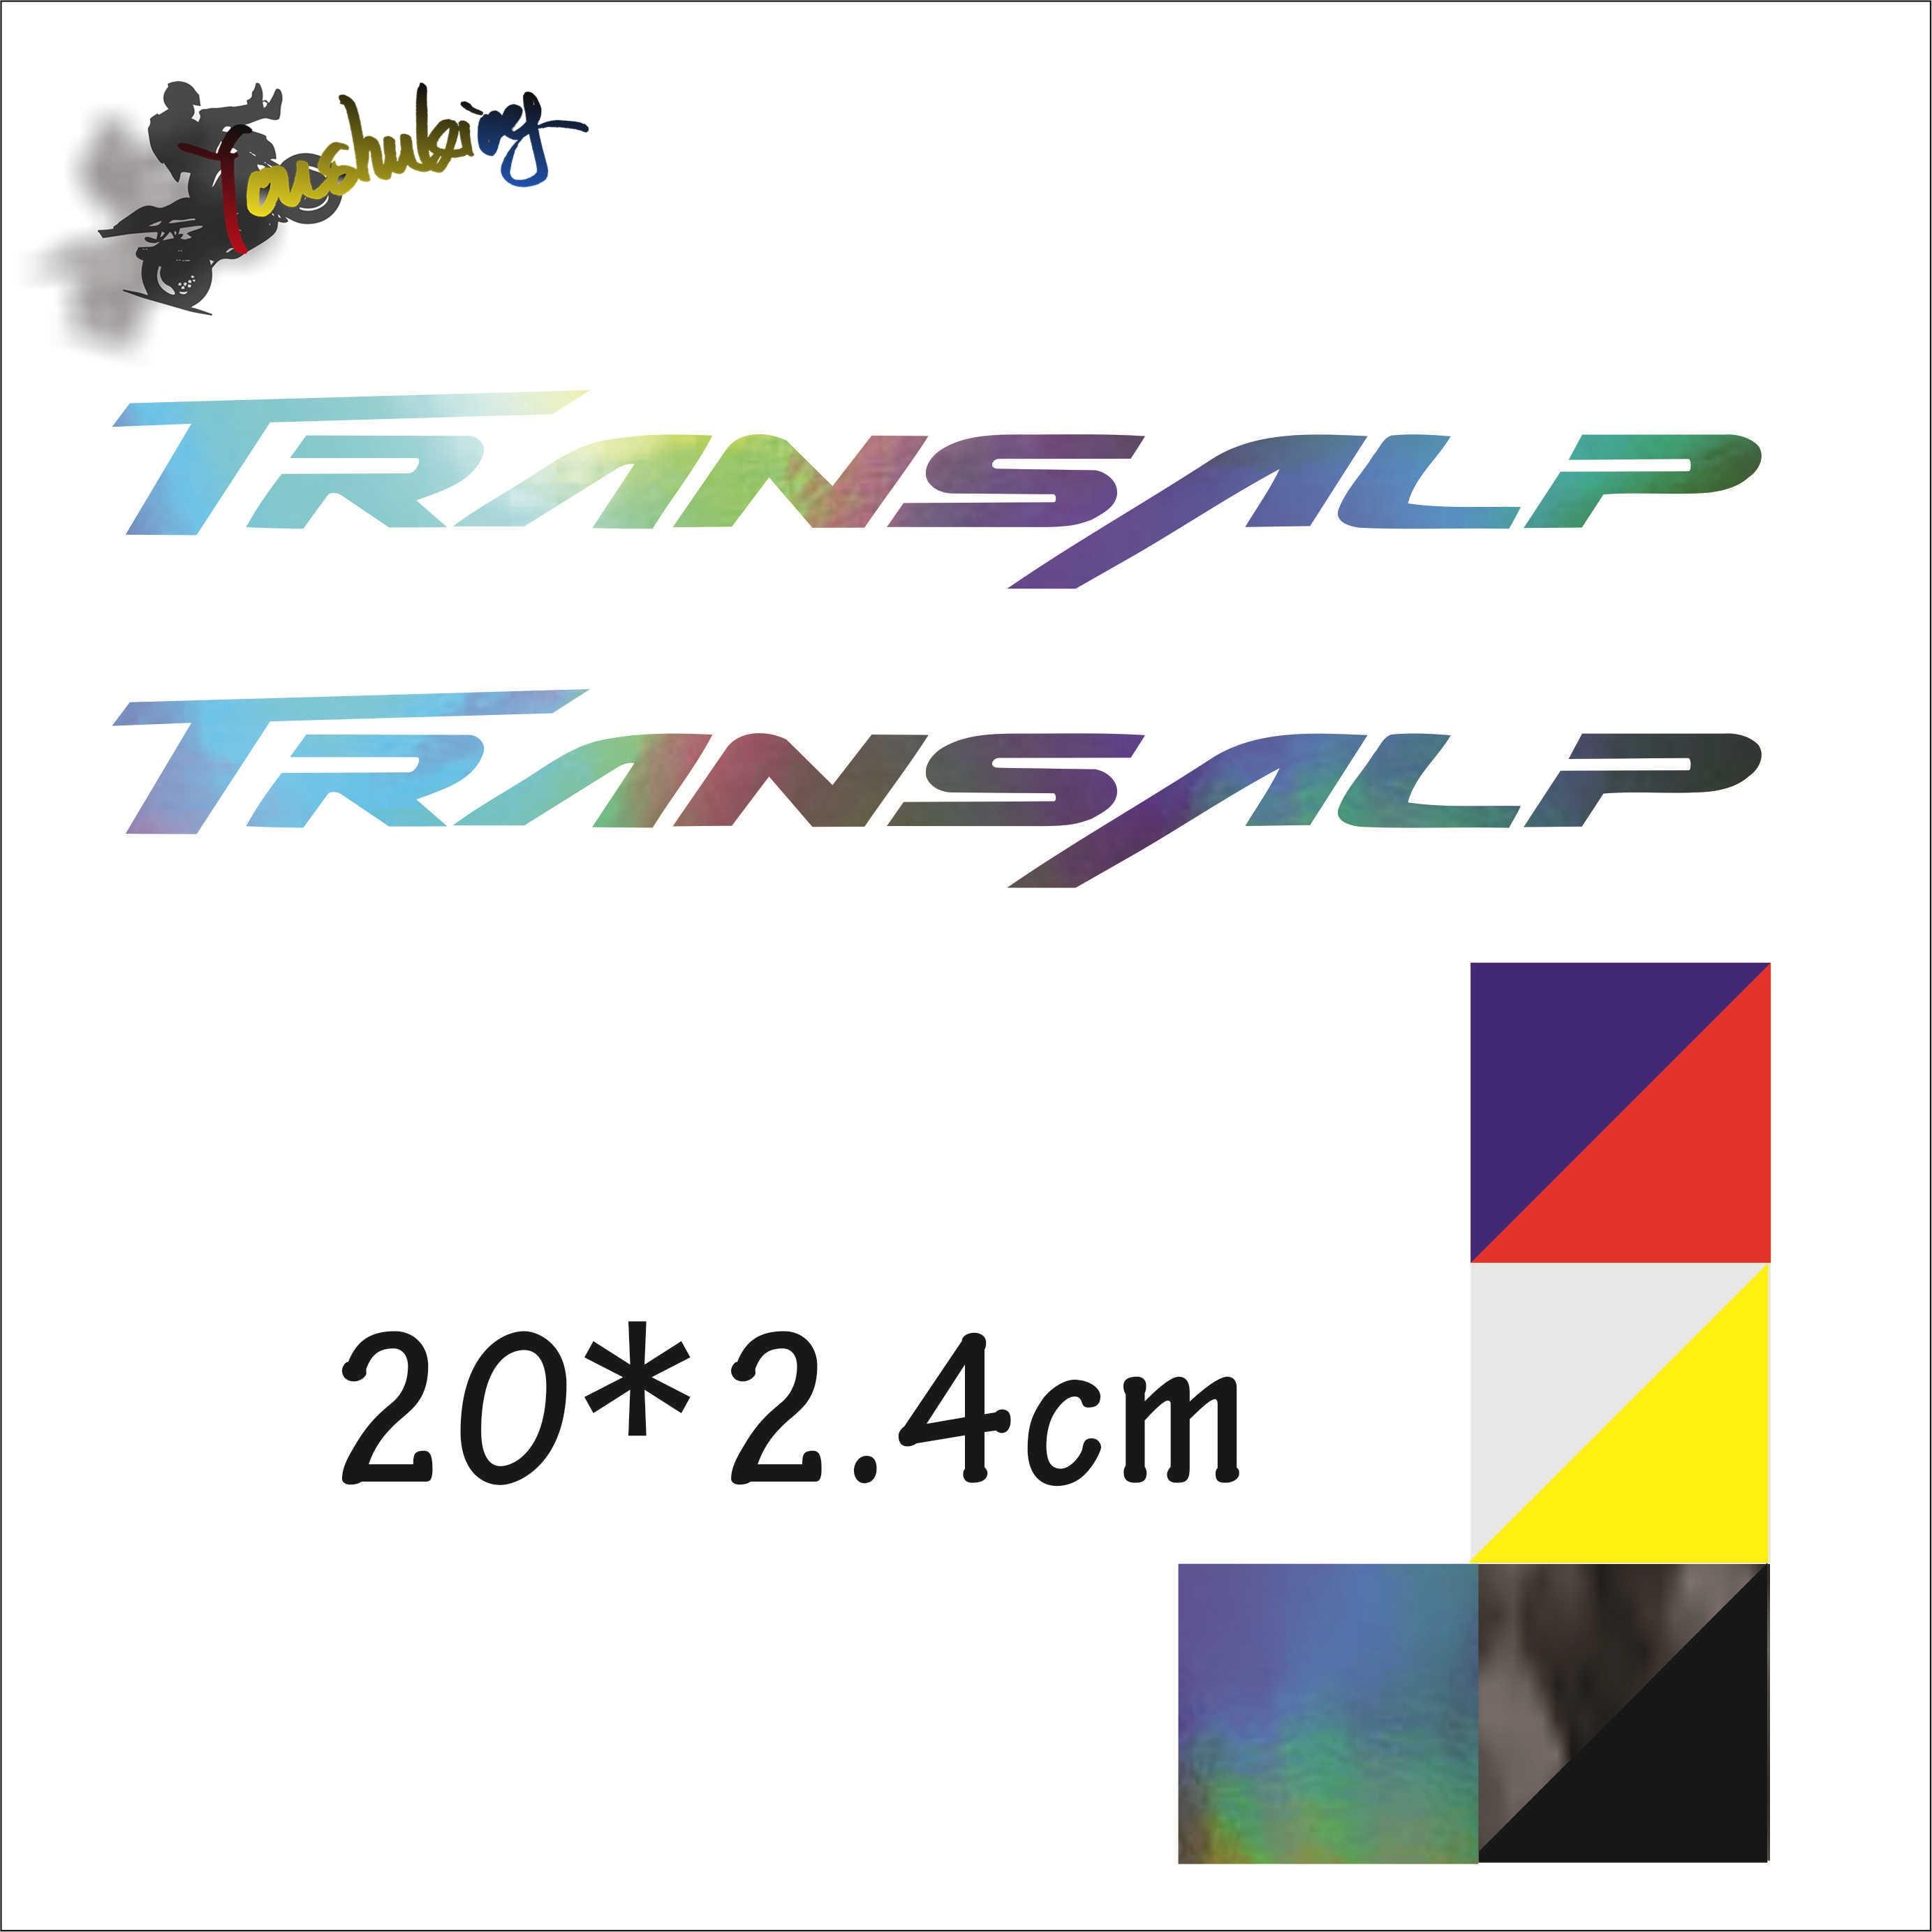 Moto rcycle etiket moto gp vücut model kask rüzgar kişilik için fit XL650V transalp transalp400v